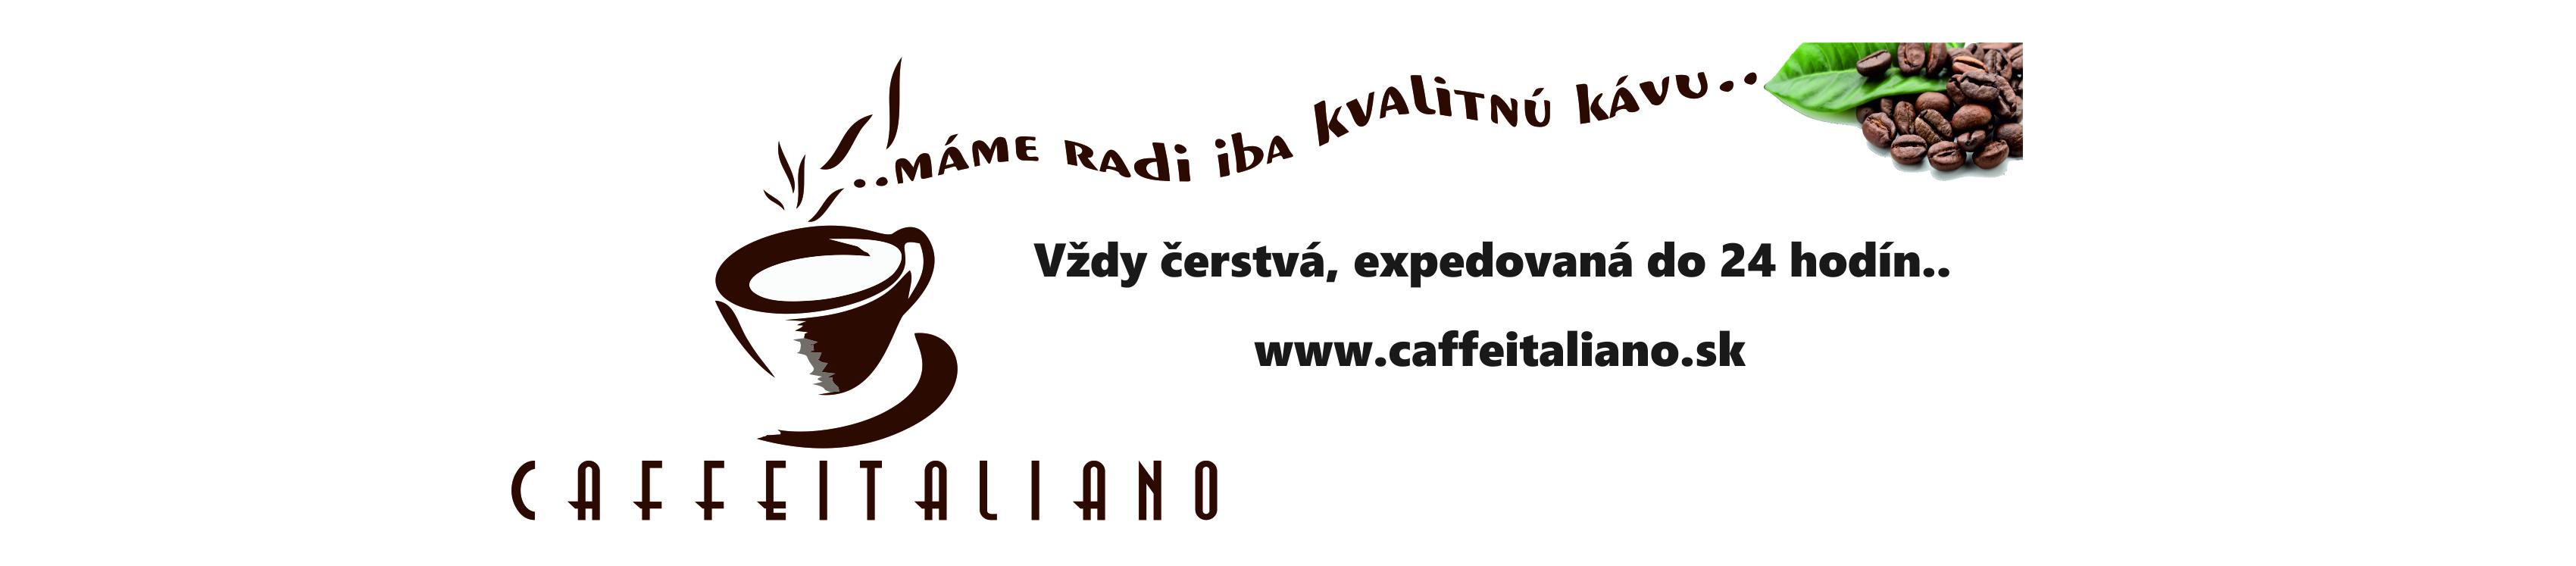 caffeitaliano eshop zrnkova talianska kvalitna kava kavicka zawmark plus